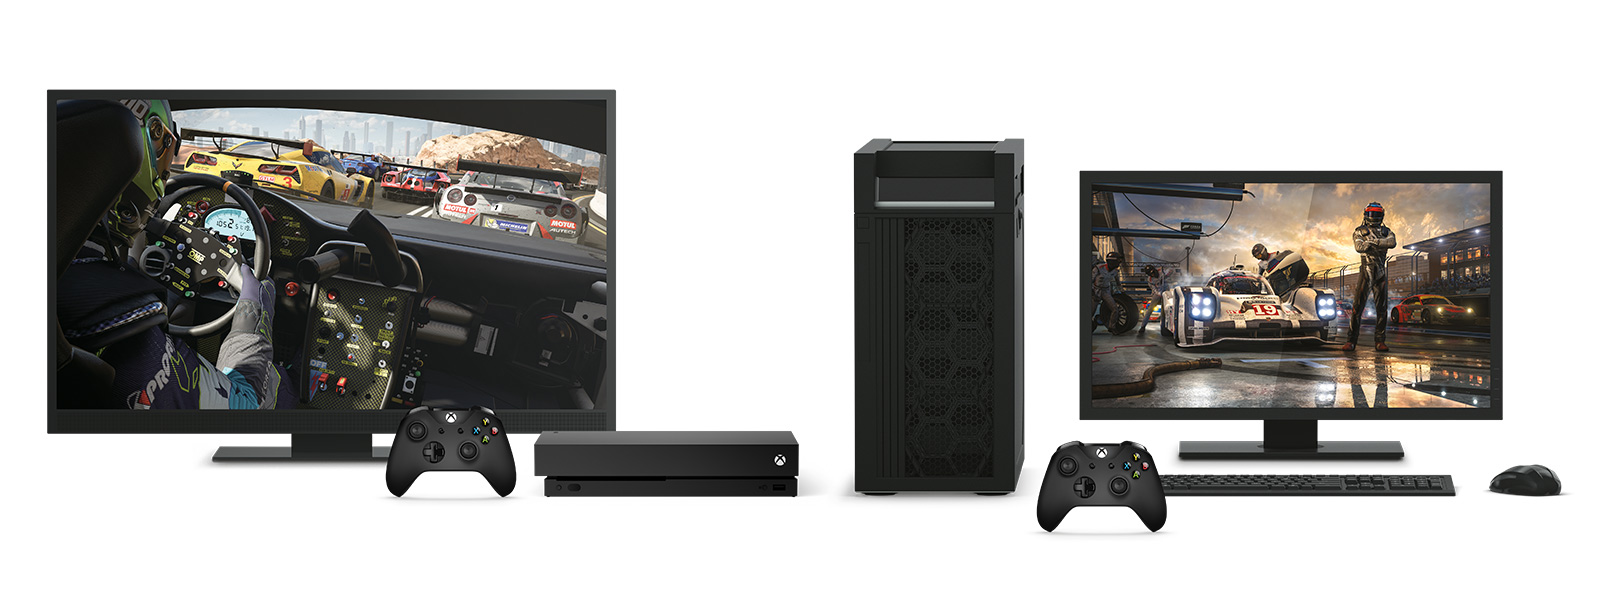 Xbox One X και επιτραπέζια συσκευή 4K με Forza Motorsport 7 σε τηλεόραση και οθόνη υπολογιστή